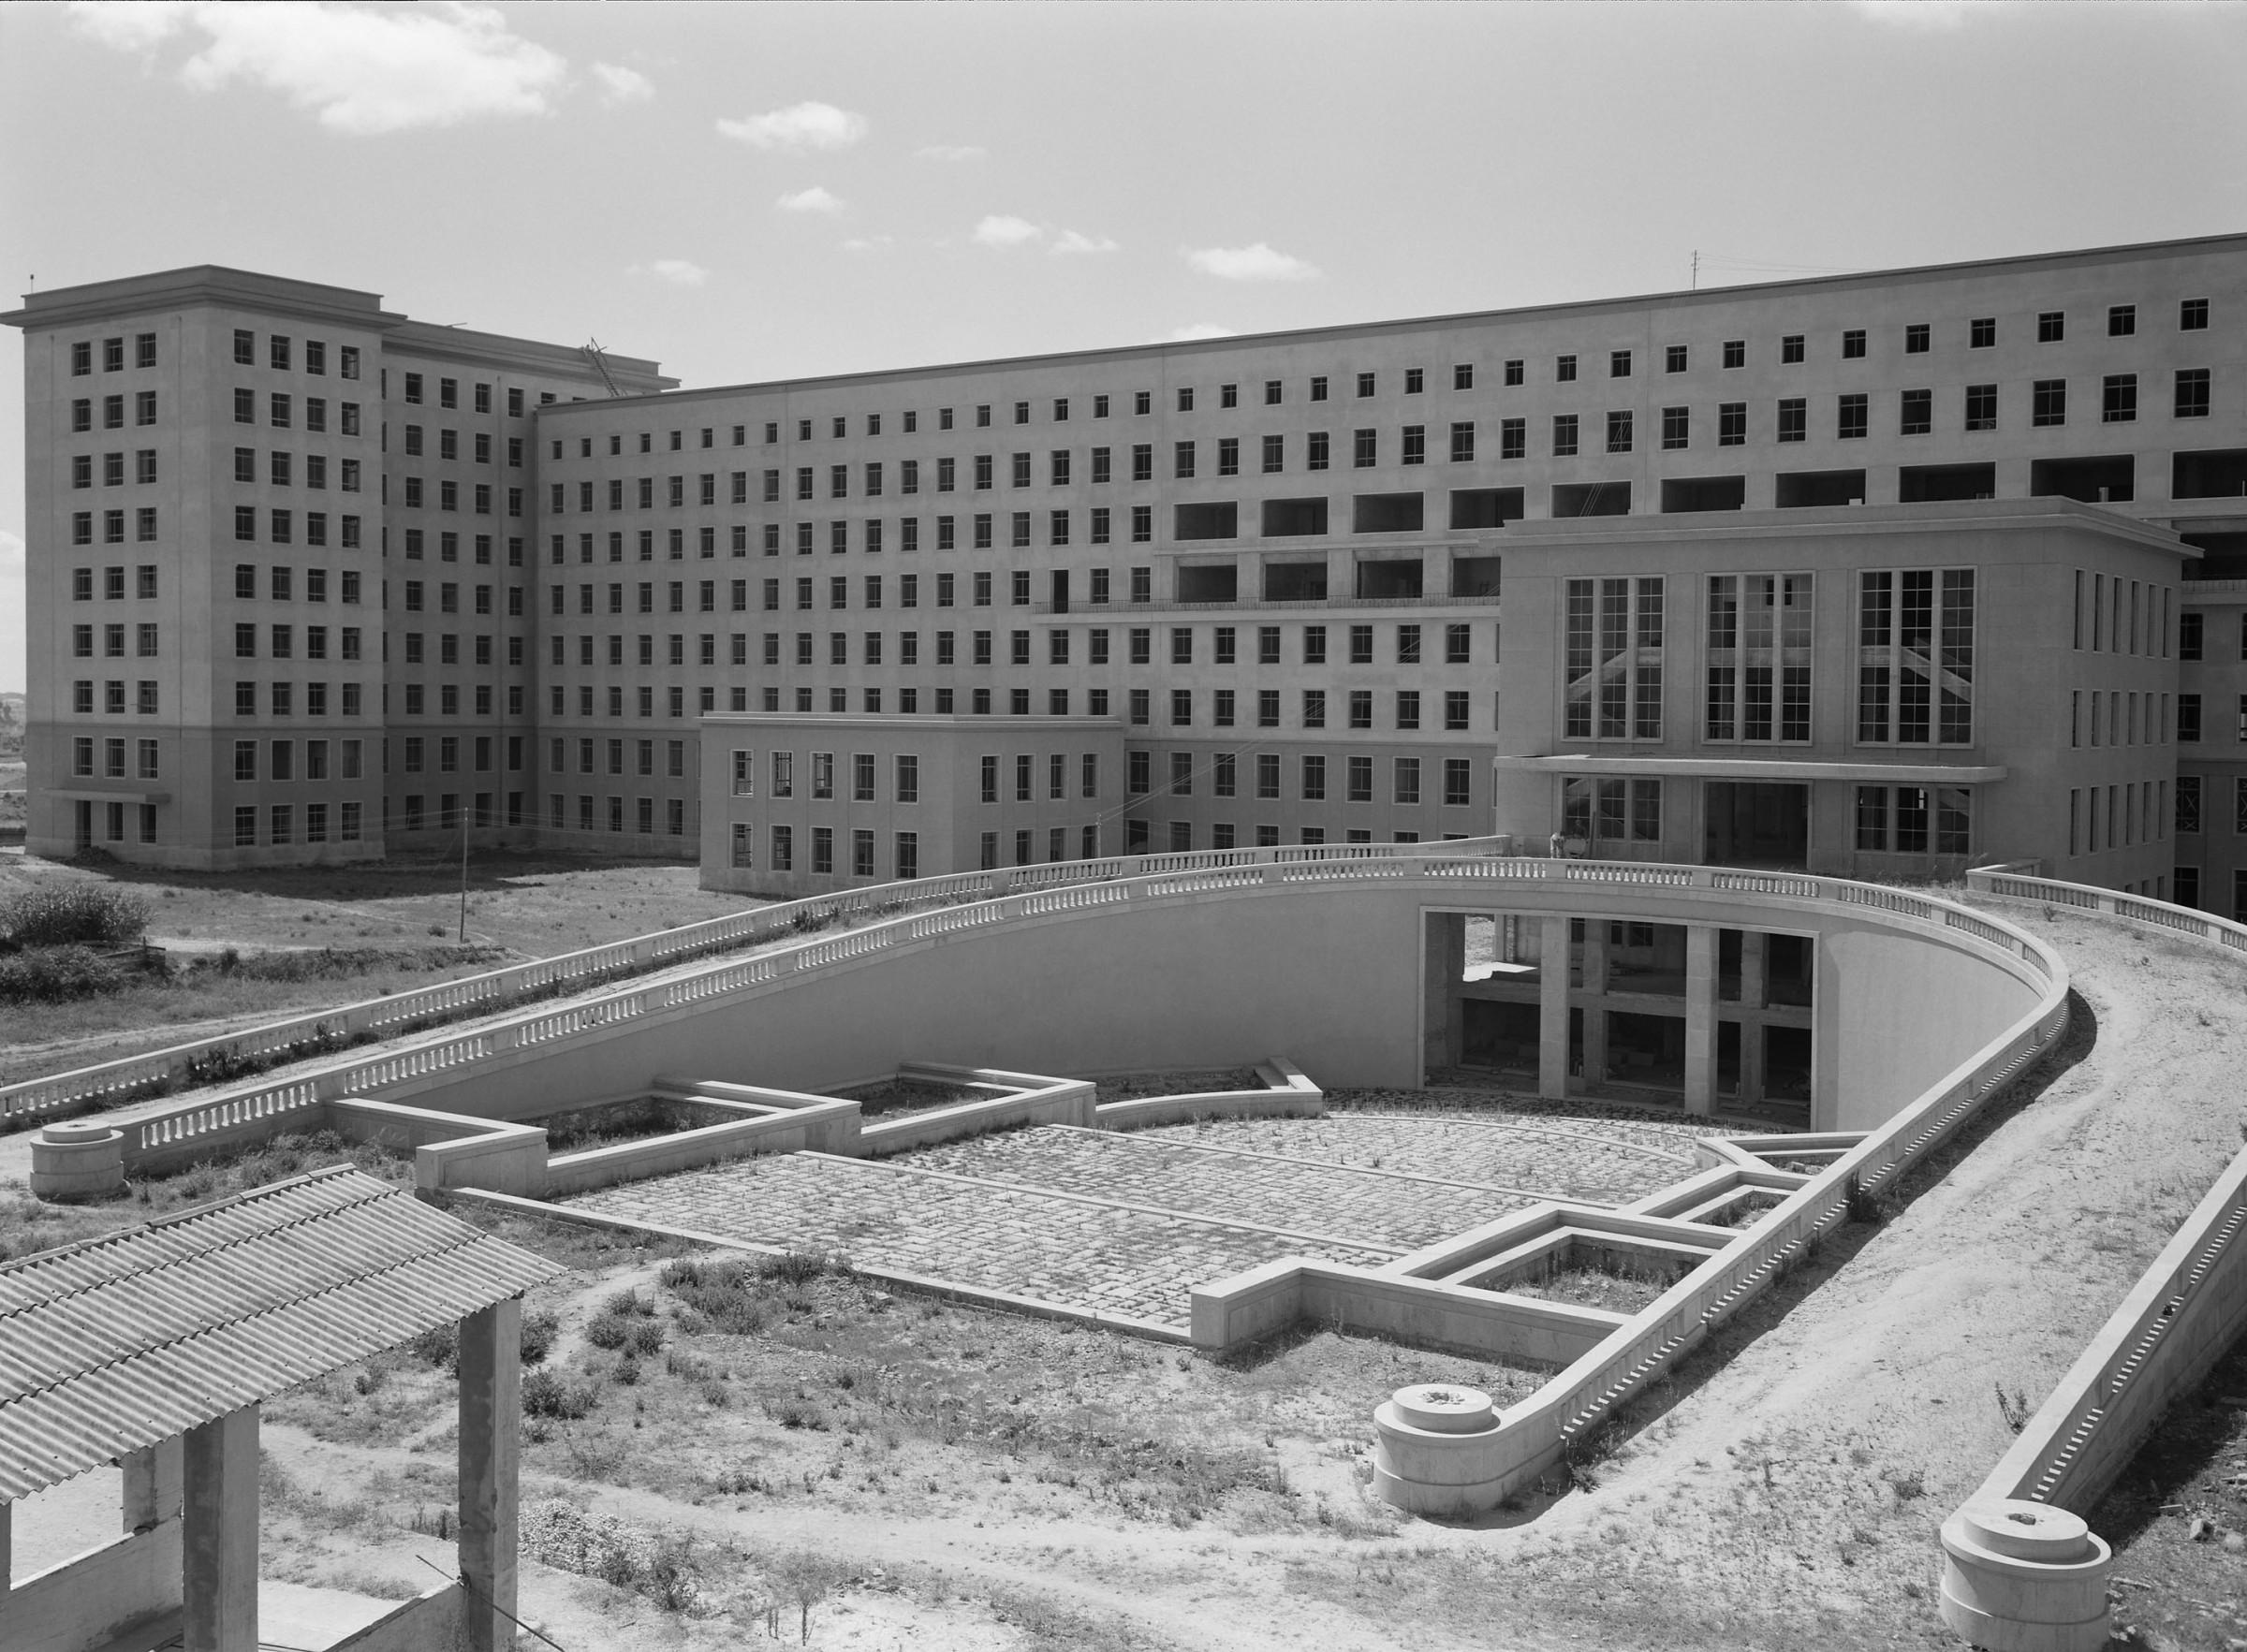 10-construc3a7c3a3o-hsm-1950.jpg